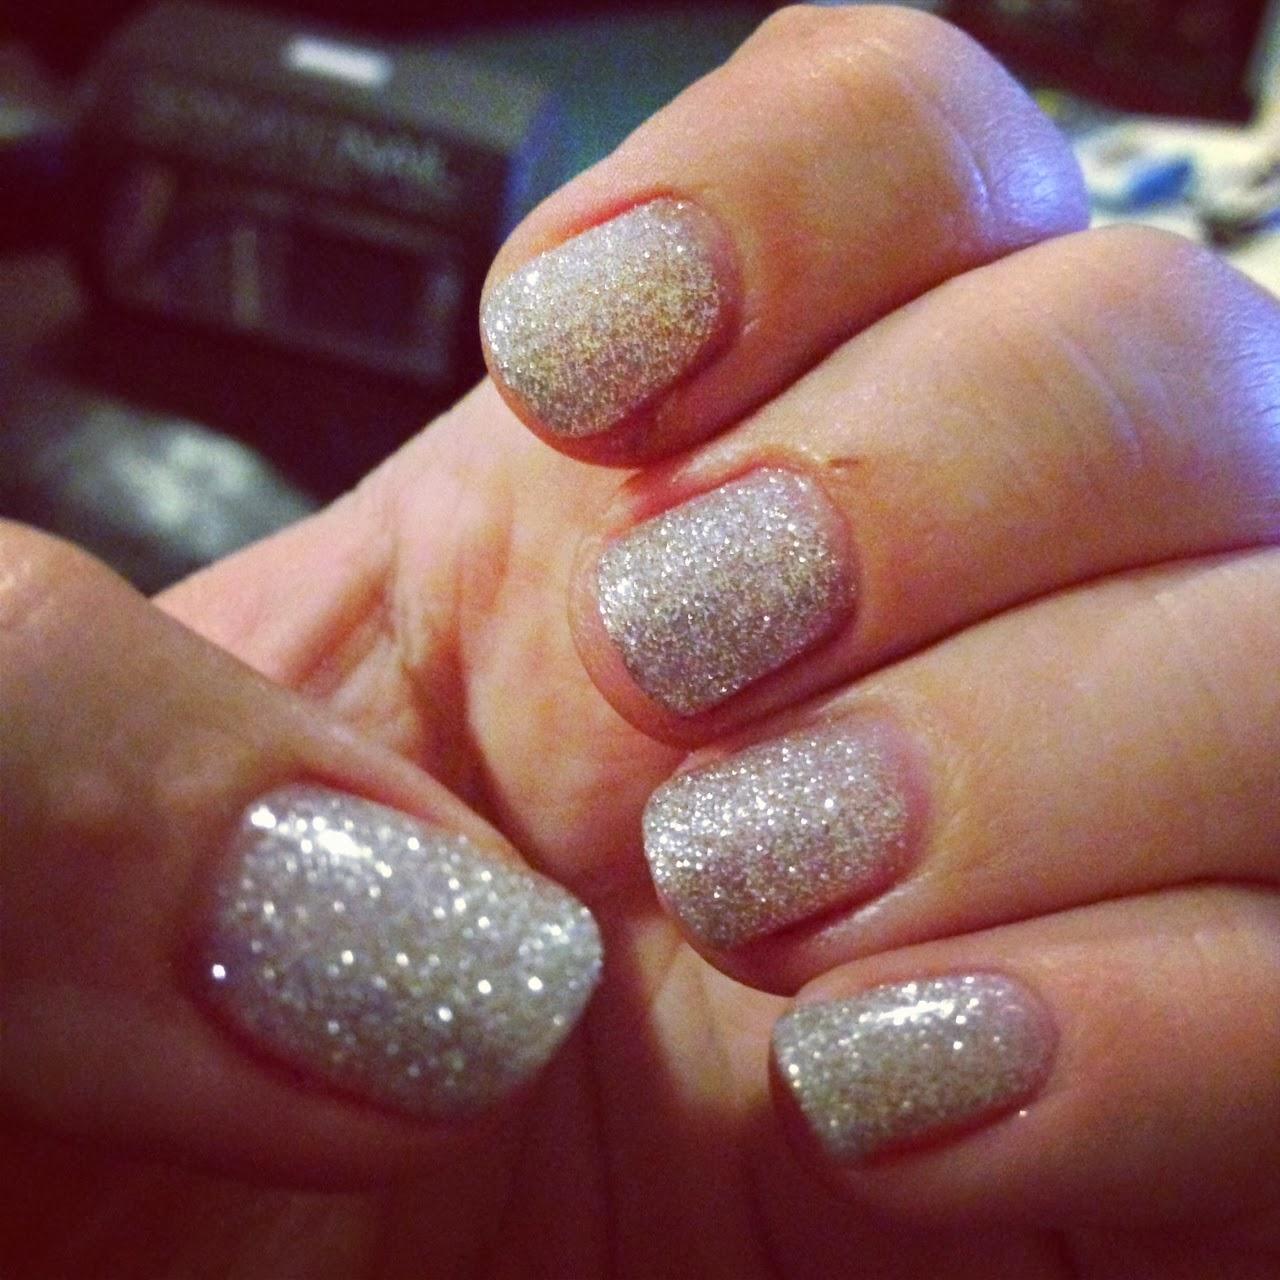 Sensationail Gel Nail Polish (silver Glitter) | Splendid Wedding Company